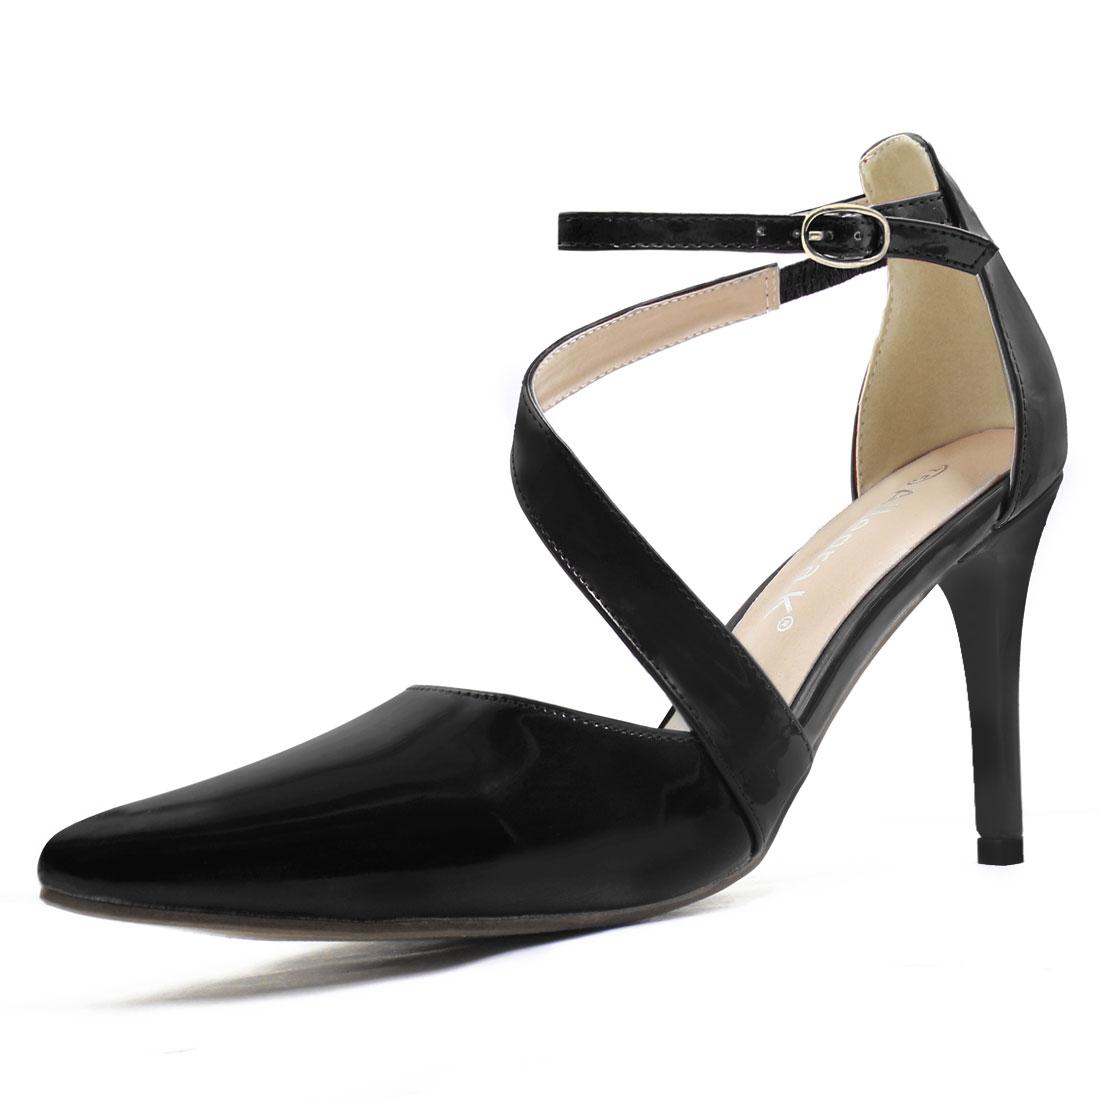 Women Asymmetrical Strap Stiletto Heel Pointy-Toe Pumps Black US 8.5